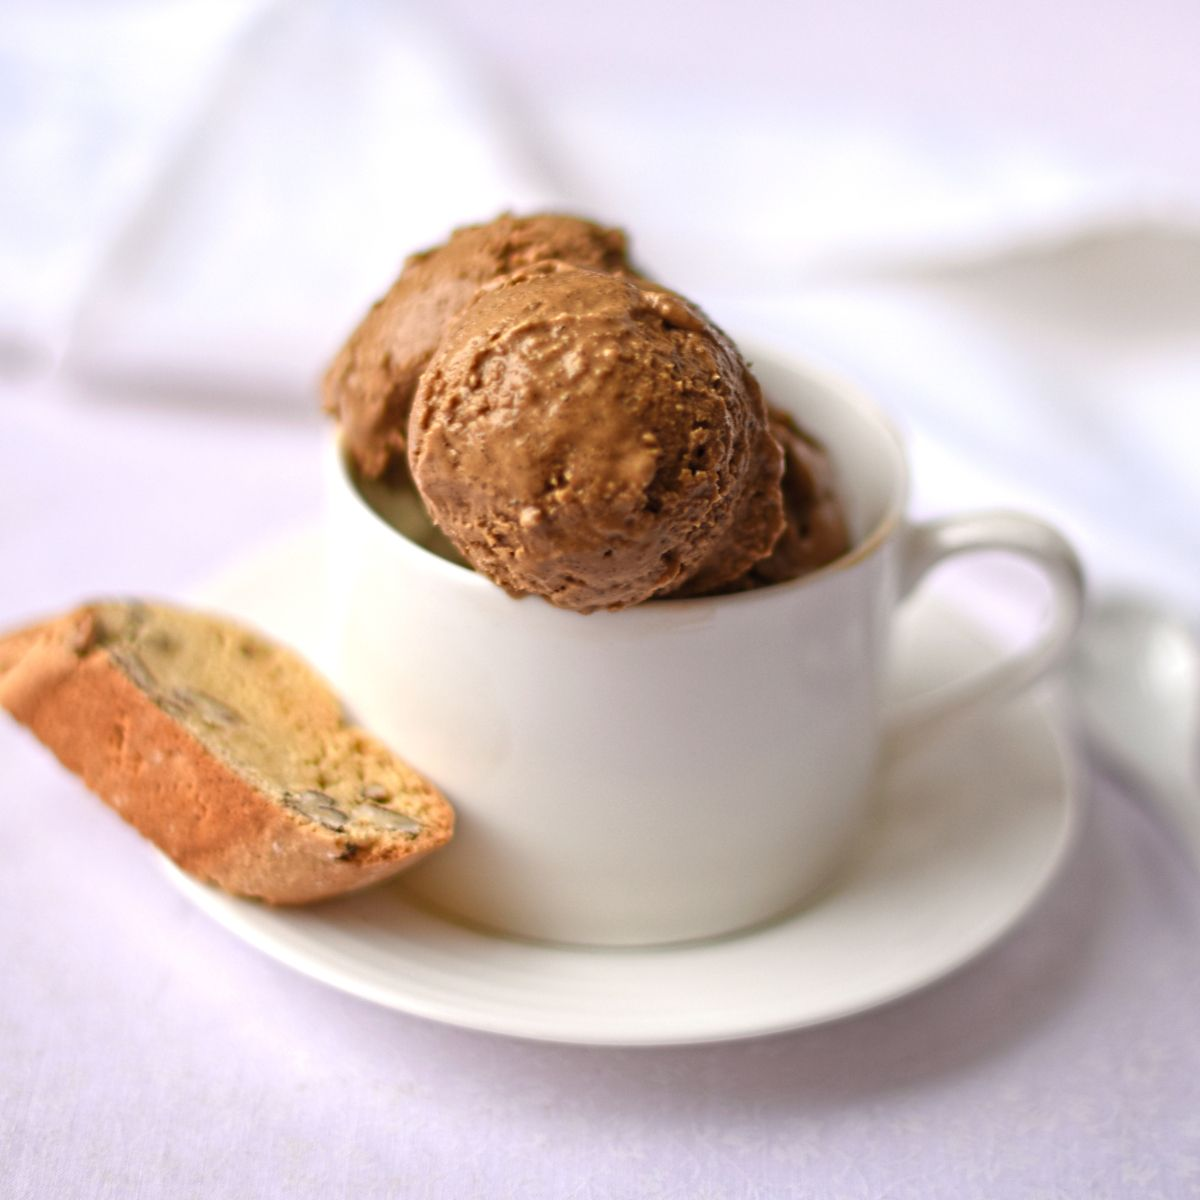 Vegan coffee ice cream with pecan biscotti recipe for Fairtrade Fortnight from @circusgardener